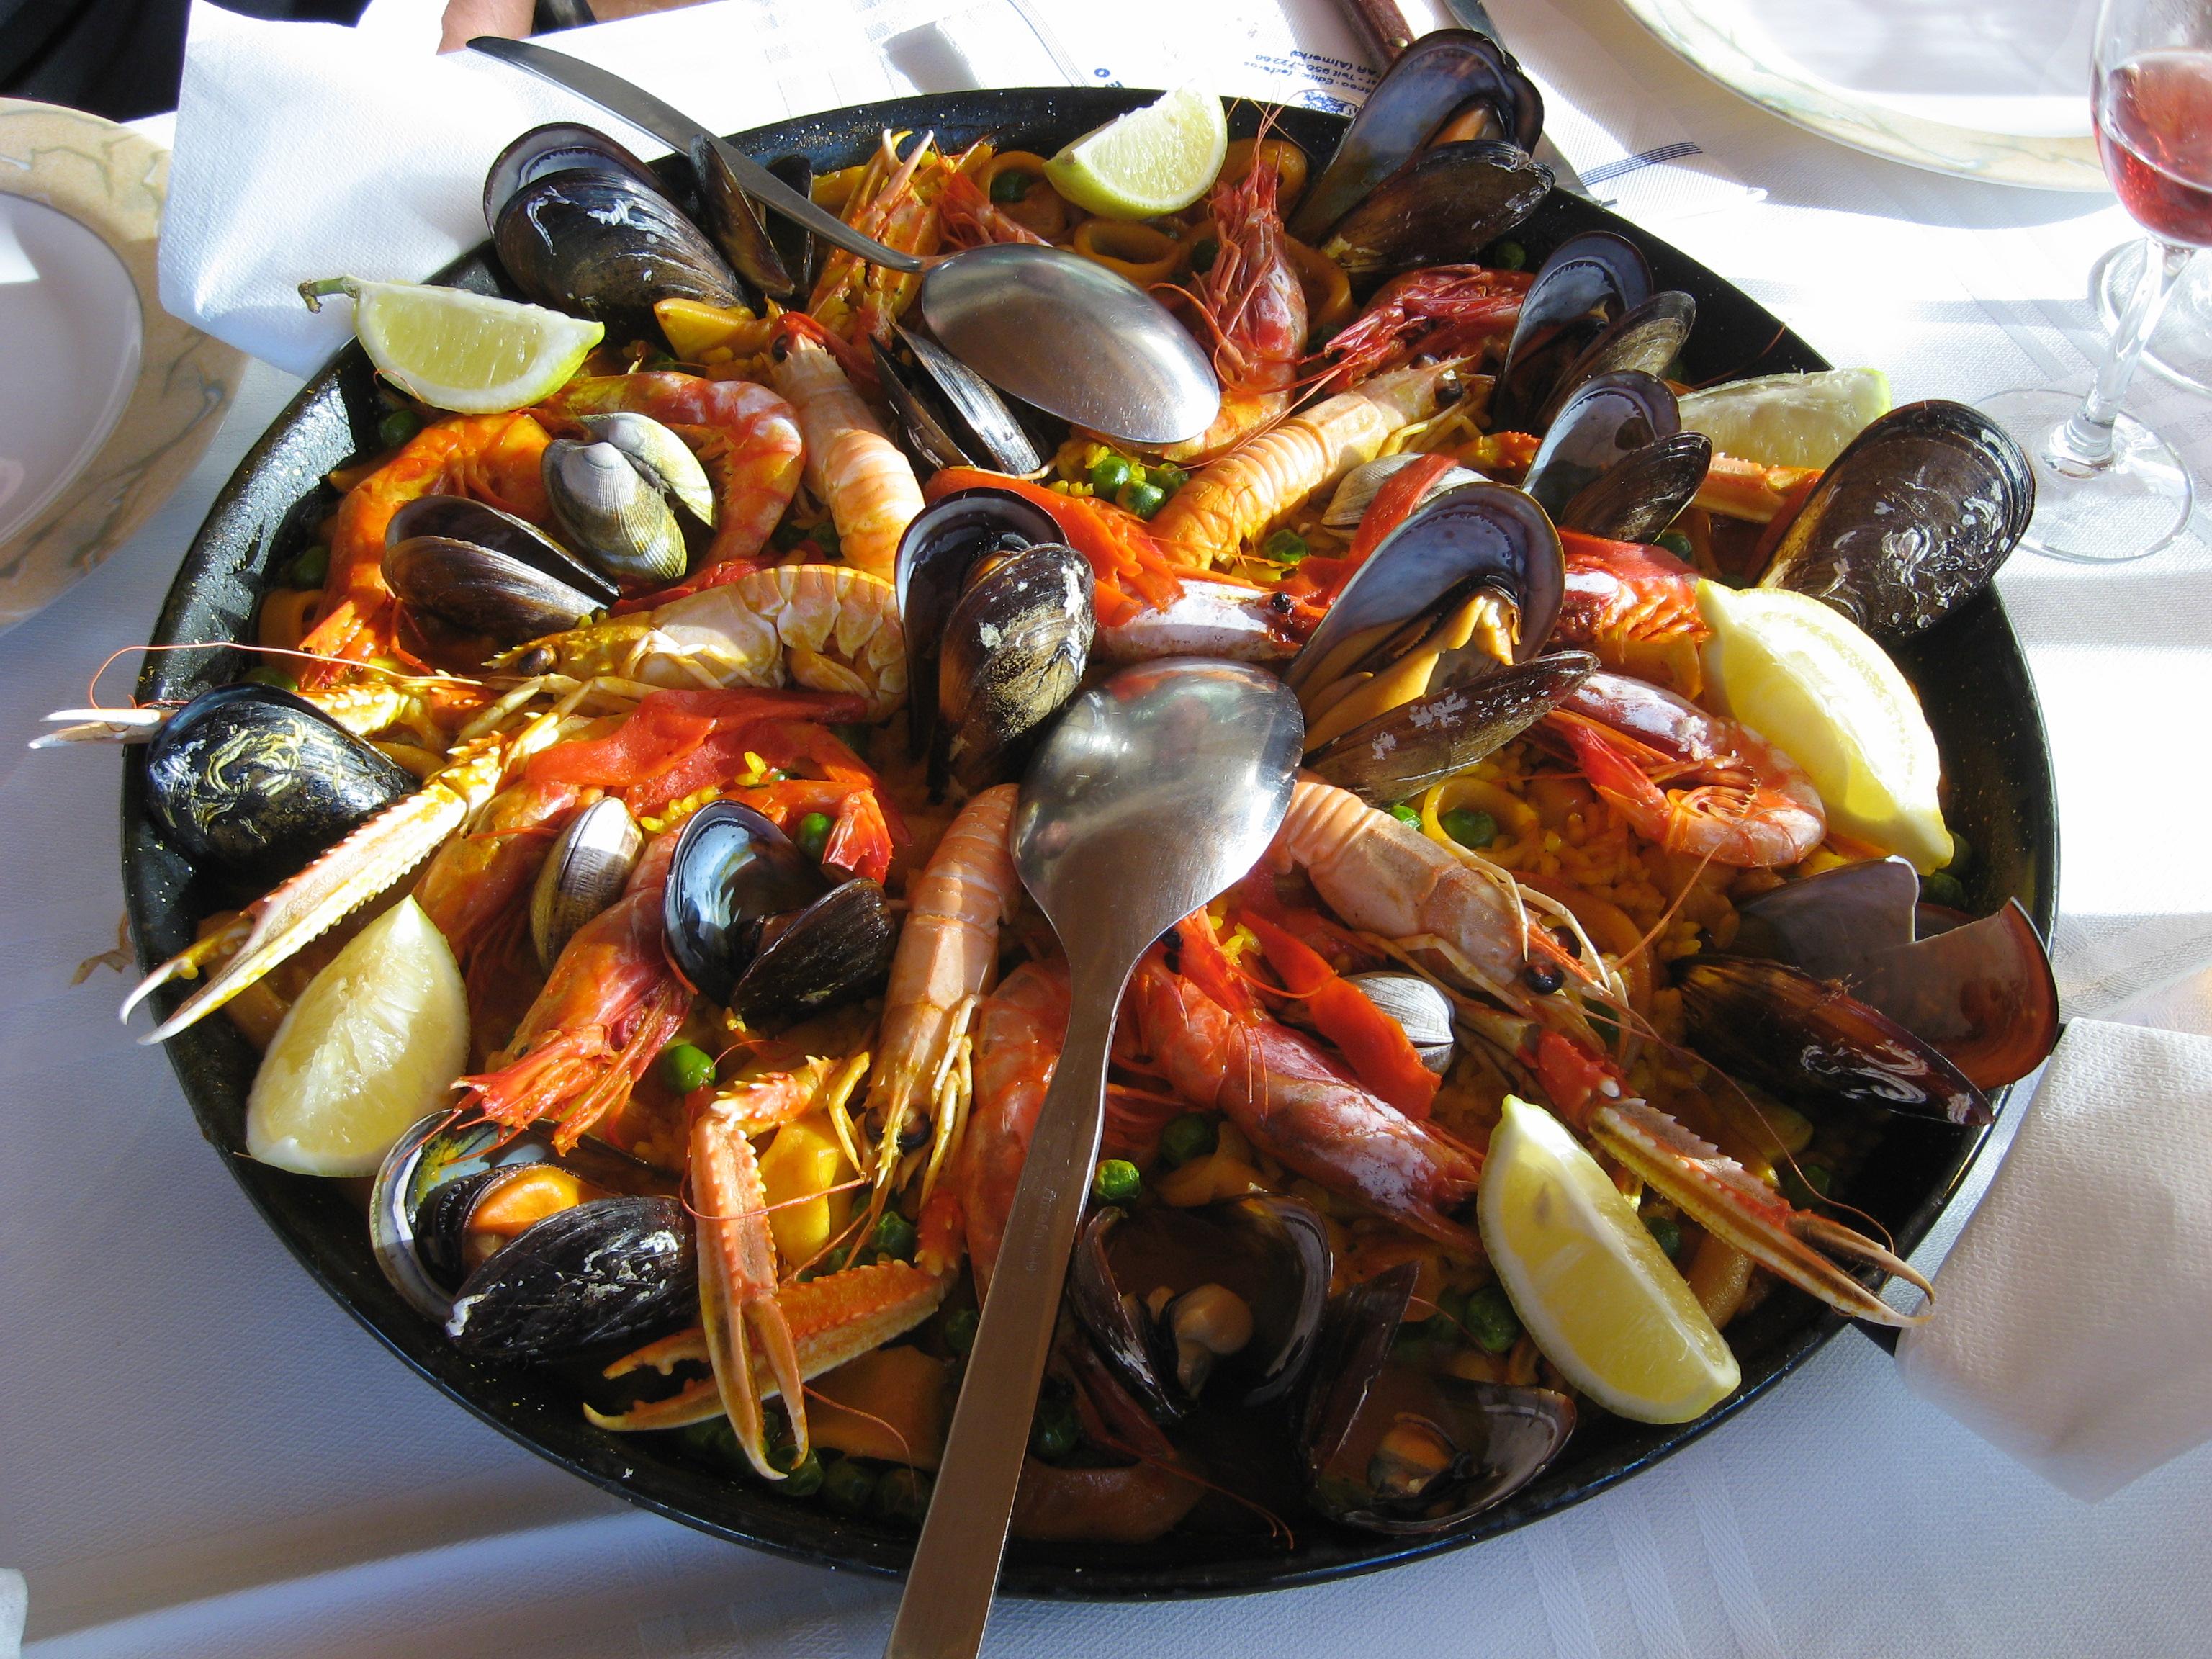 File:Paella Marinara.JPG - Wikimedia Commons